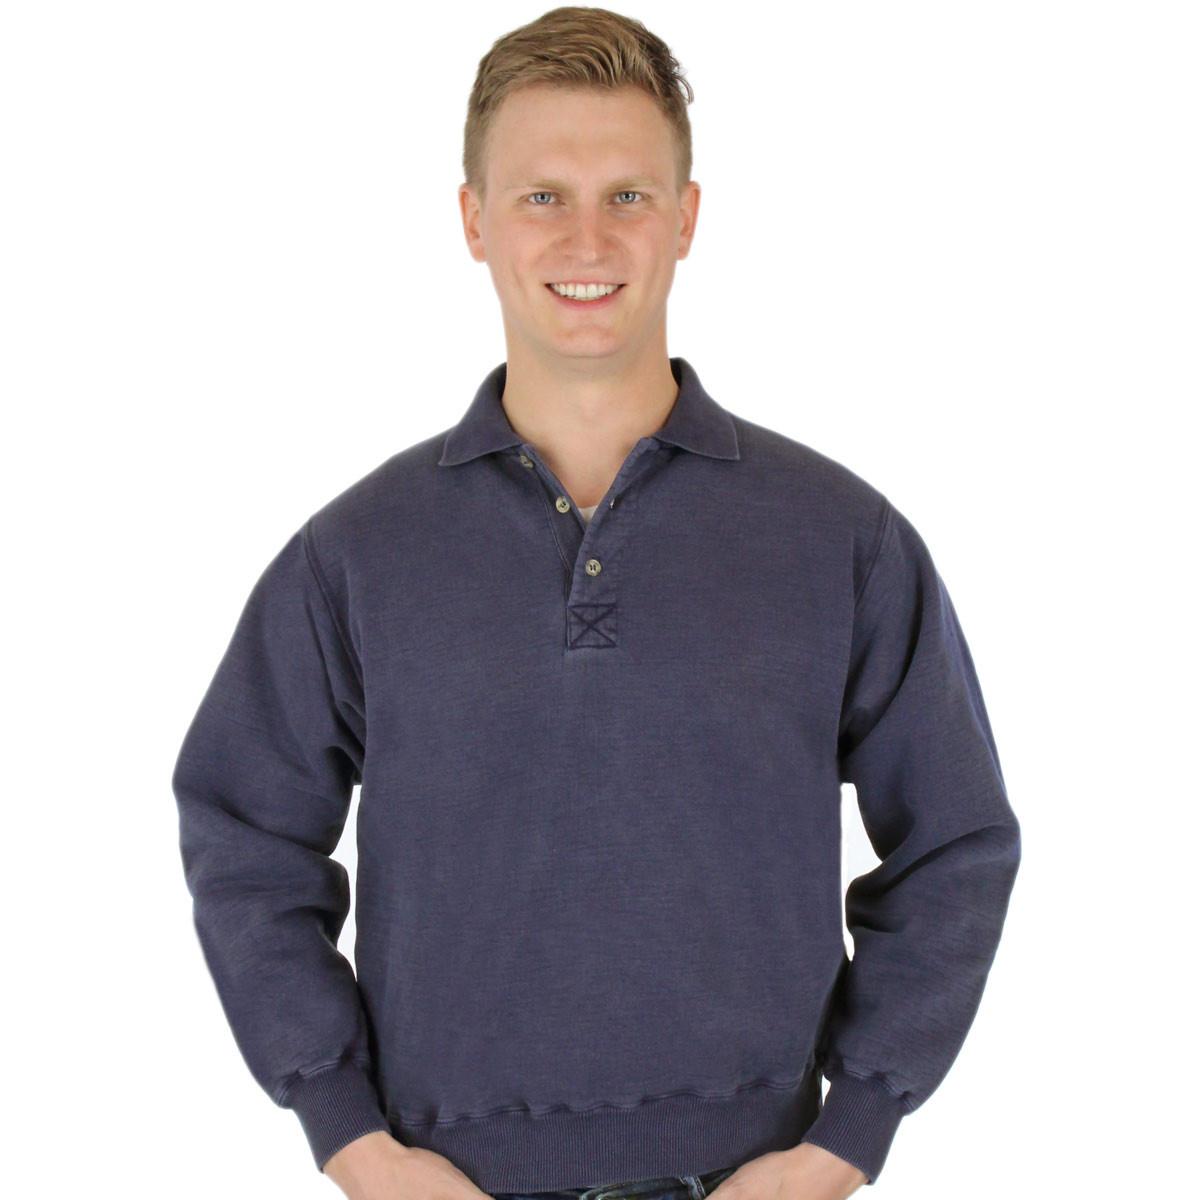 100 Heavy Cotton 3 Button Mens Polo Sweatshirt Made In Canada